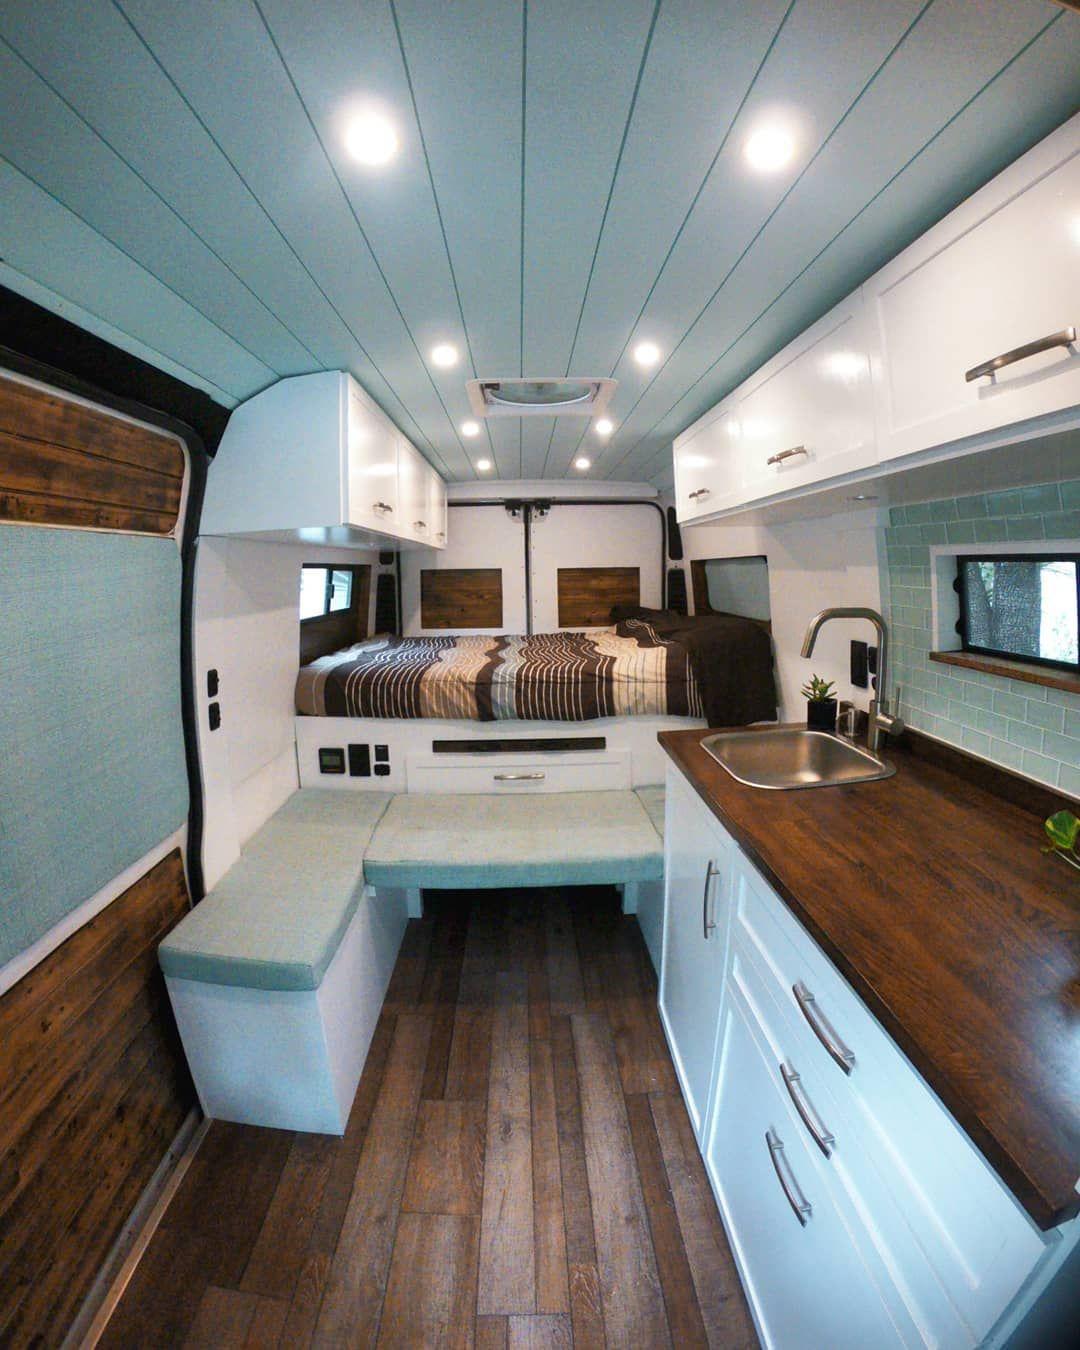 Photo of Dodge ProMaster Camper Conversion Ideas